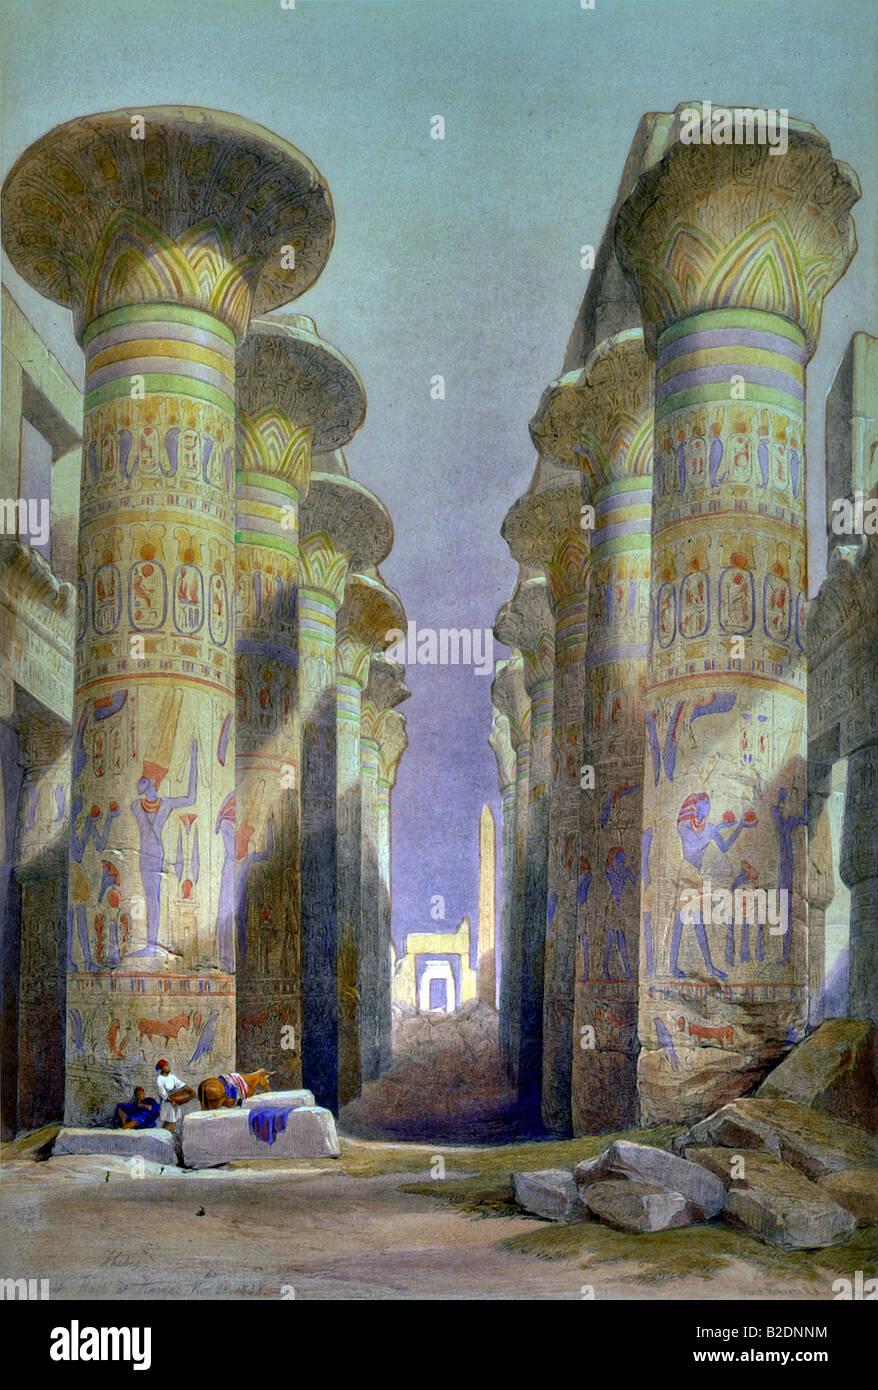 Great Hypostyle Hall, Karnak, Egypte - Stock Image